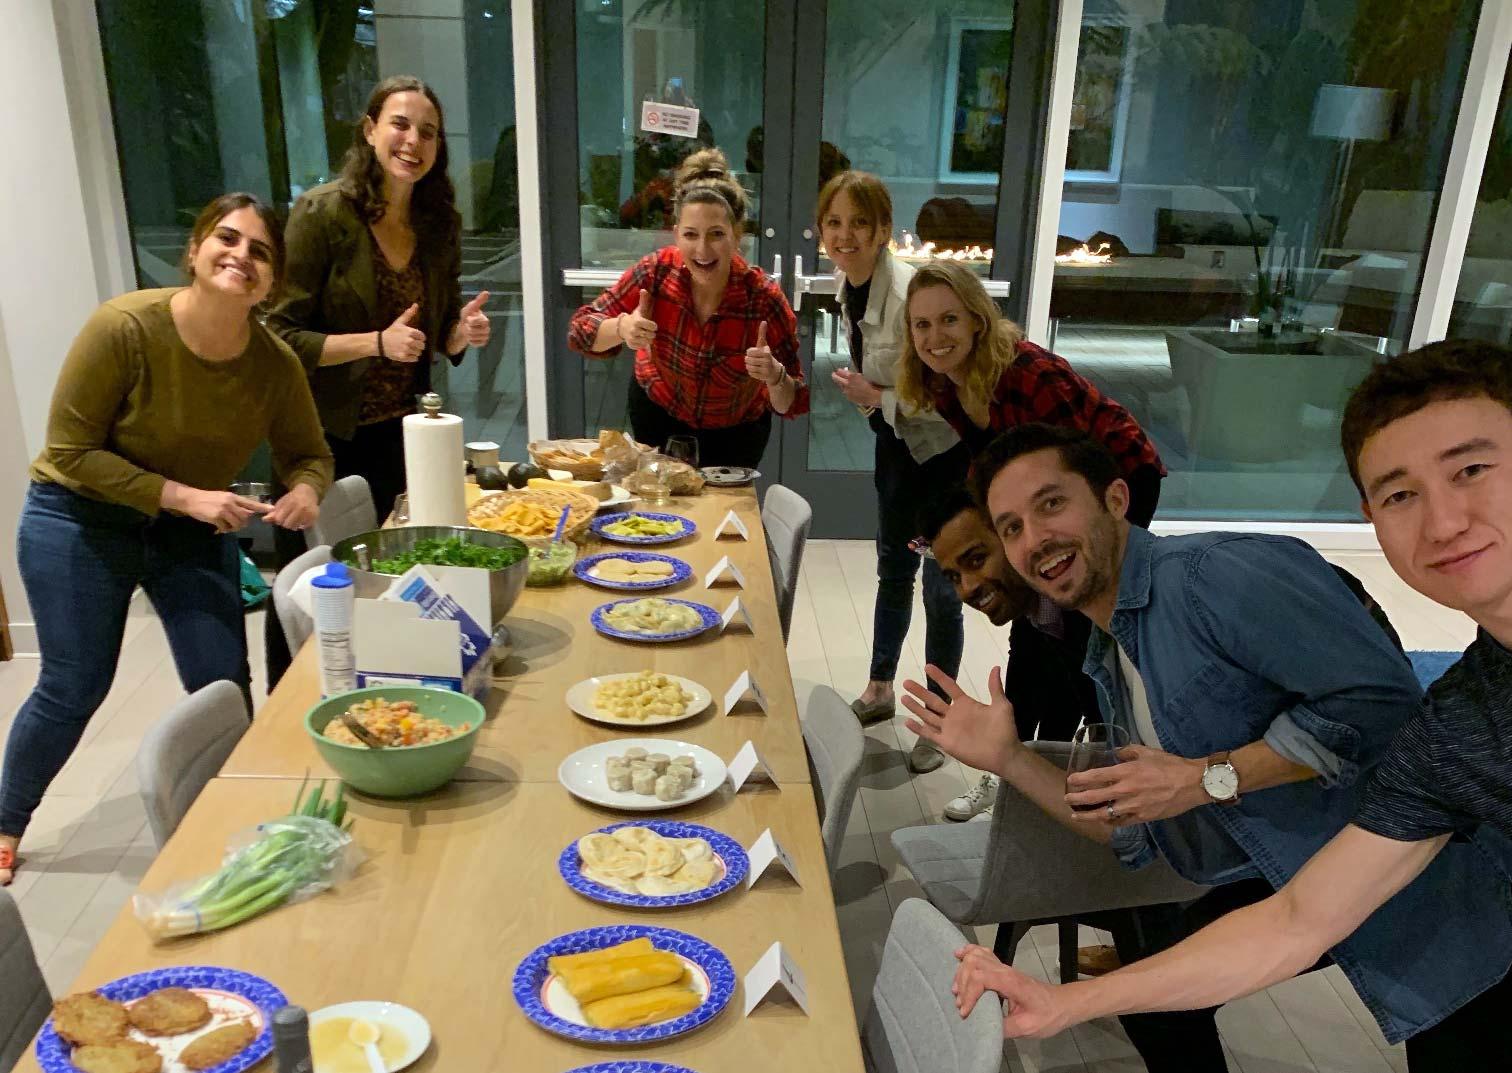 Potluck dinner with member of VFD (Virtans for Diversity)